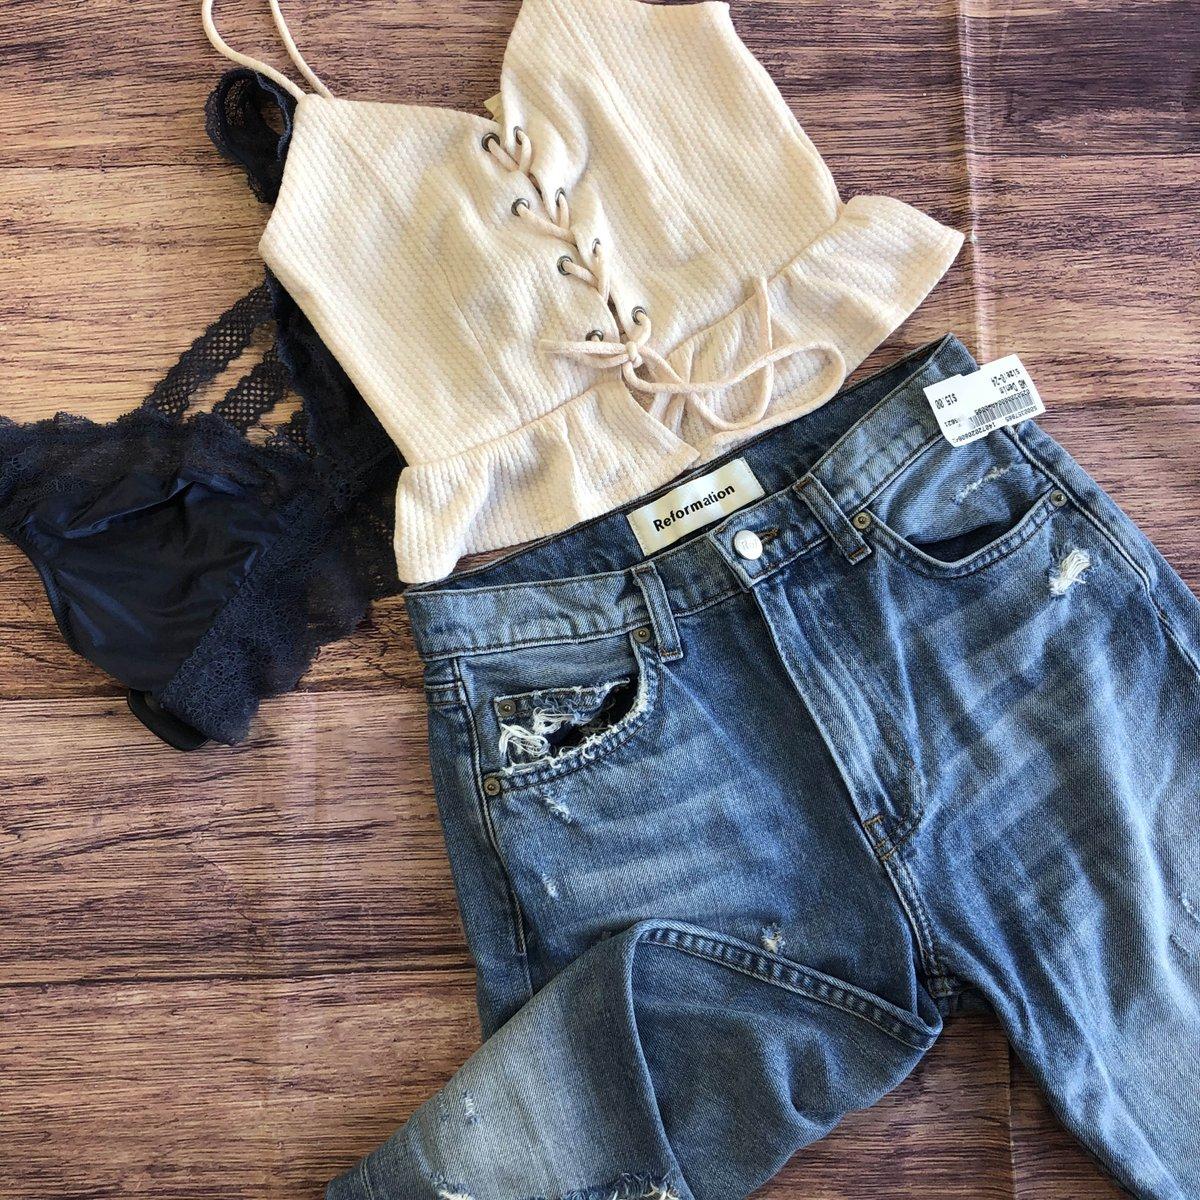 #OOTD ✨🦋☺️ *Call to hold!* Tank: XS $10 Bralette: S $5 Jeans: 0 $15 #platosankeny #platoscloset #summerdeals #backtoschool #schoolinstyle